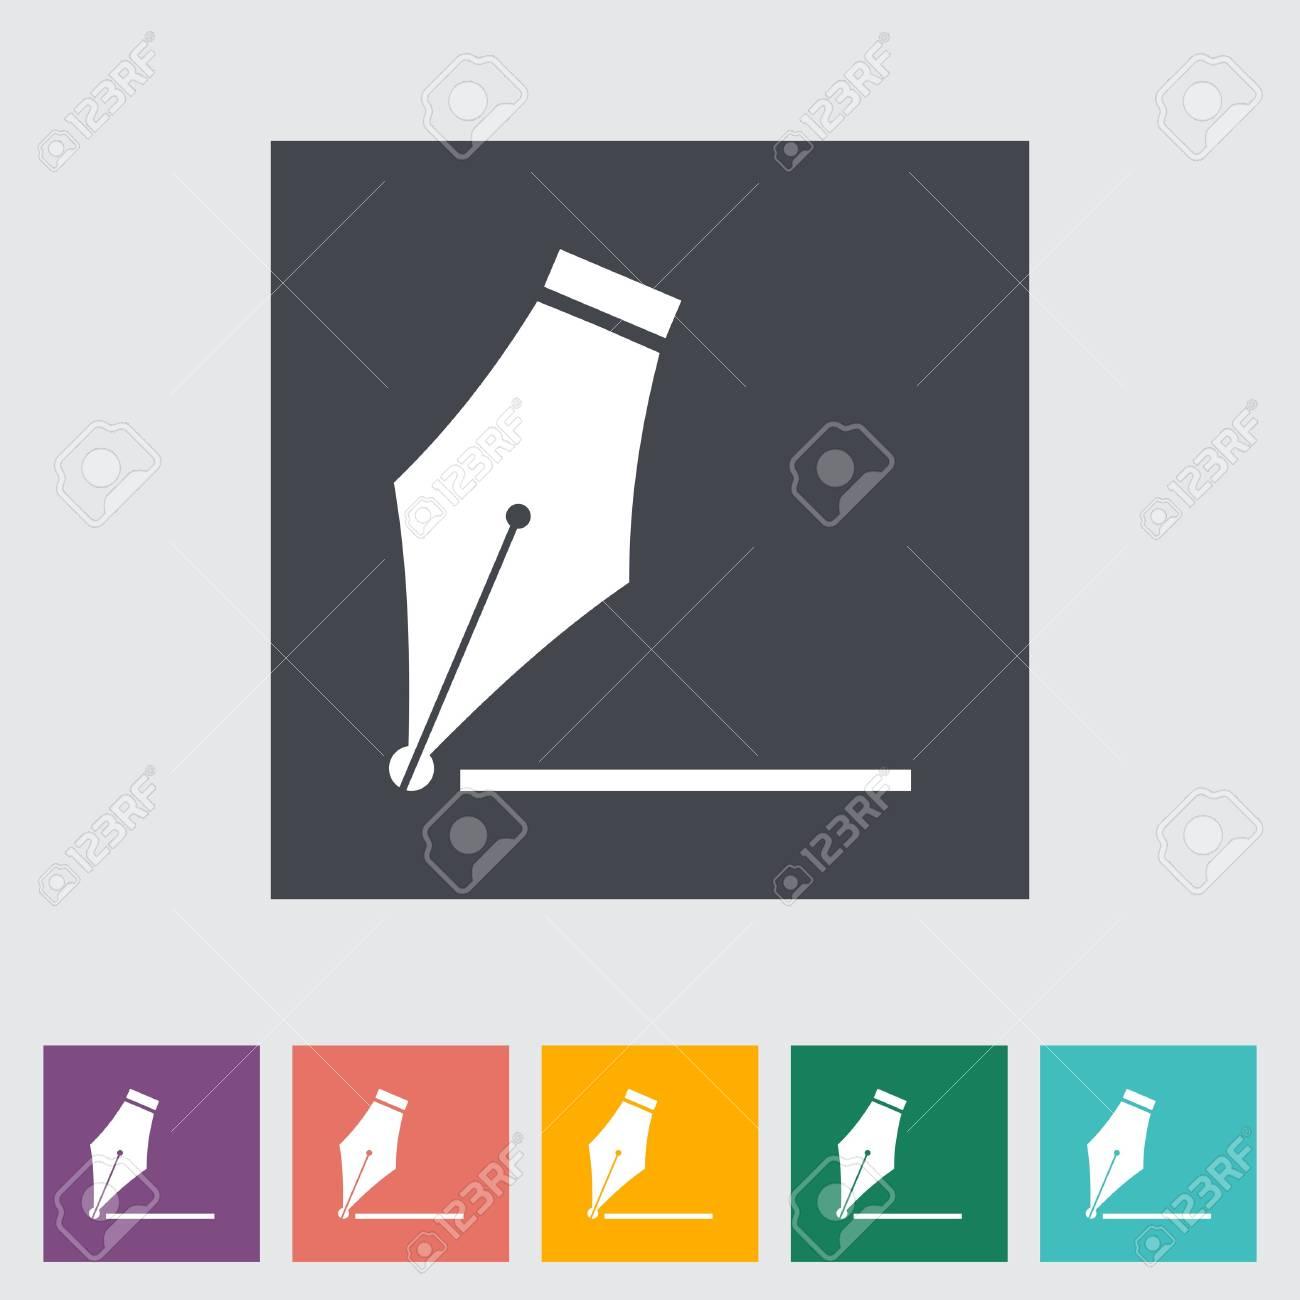 Nib. Single flat icon. Stock Vector - 21686736